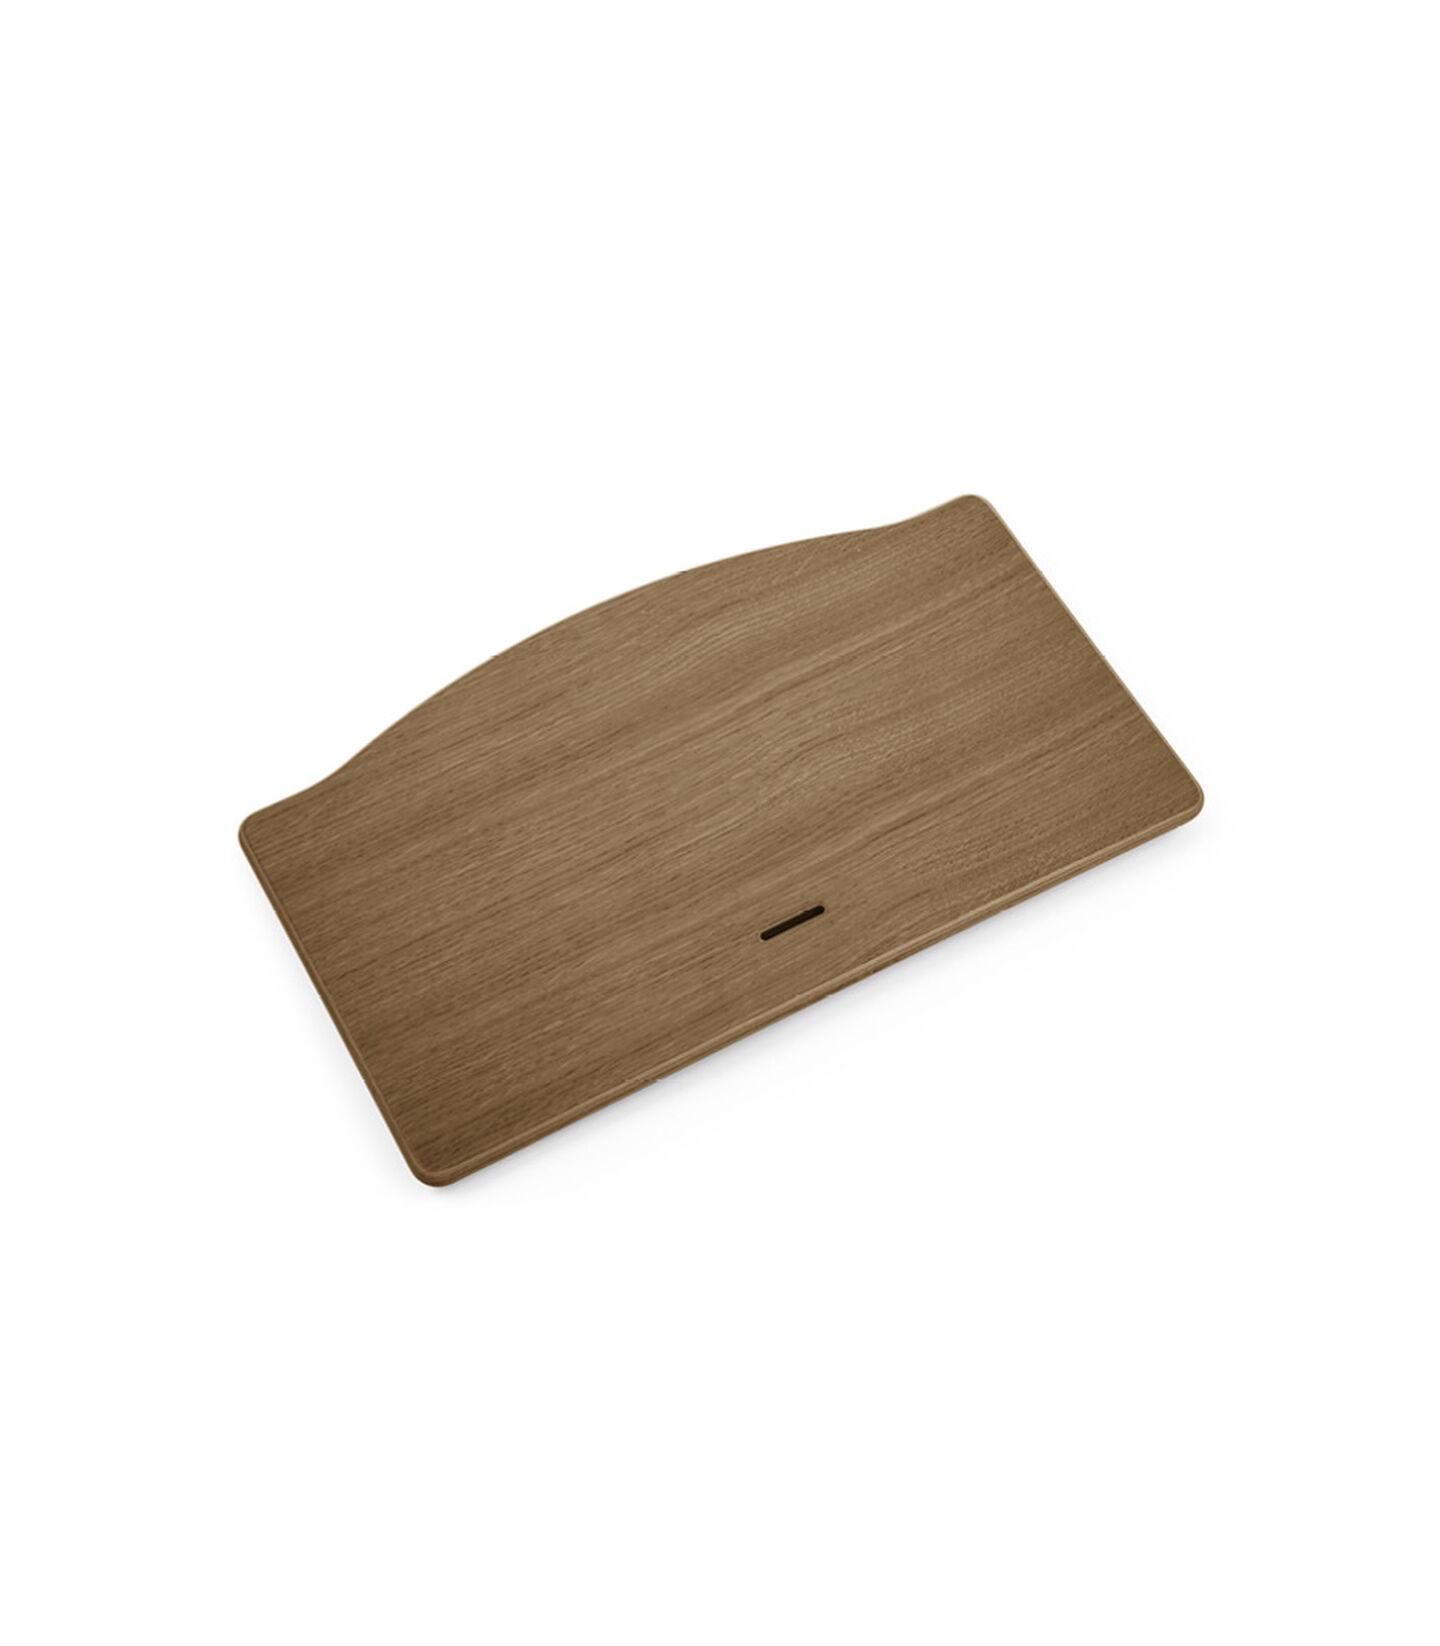 Tripp Trapp® Seatplate Oak Brown, Bruin eiken, mainview view 1